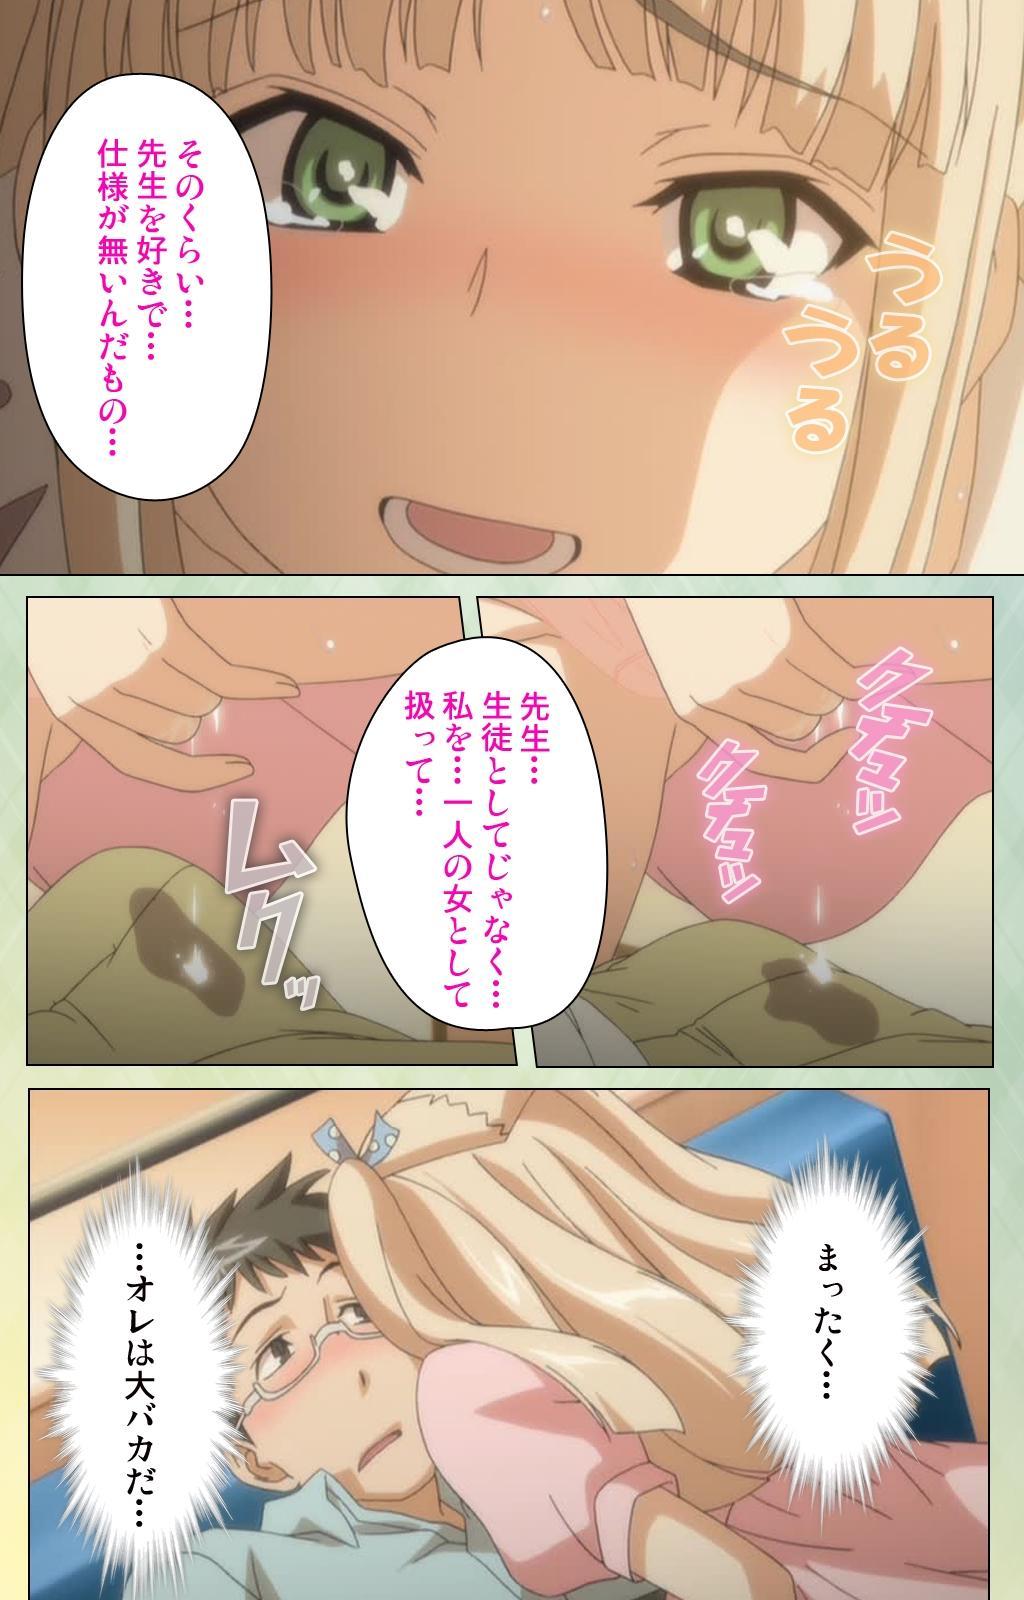 Furueru Kuchibiru fuzzy lips1 Complete Ban 59